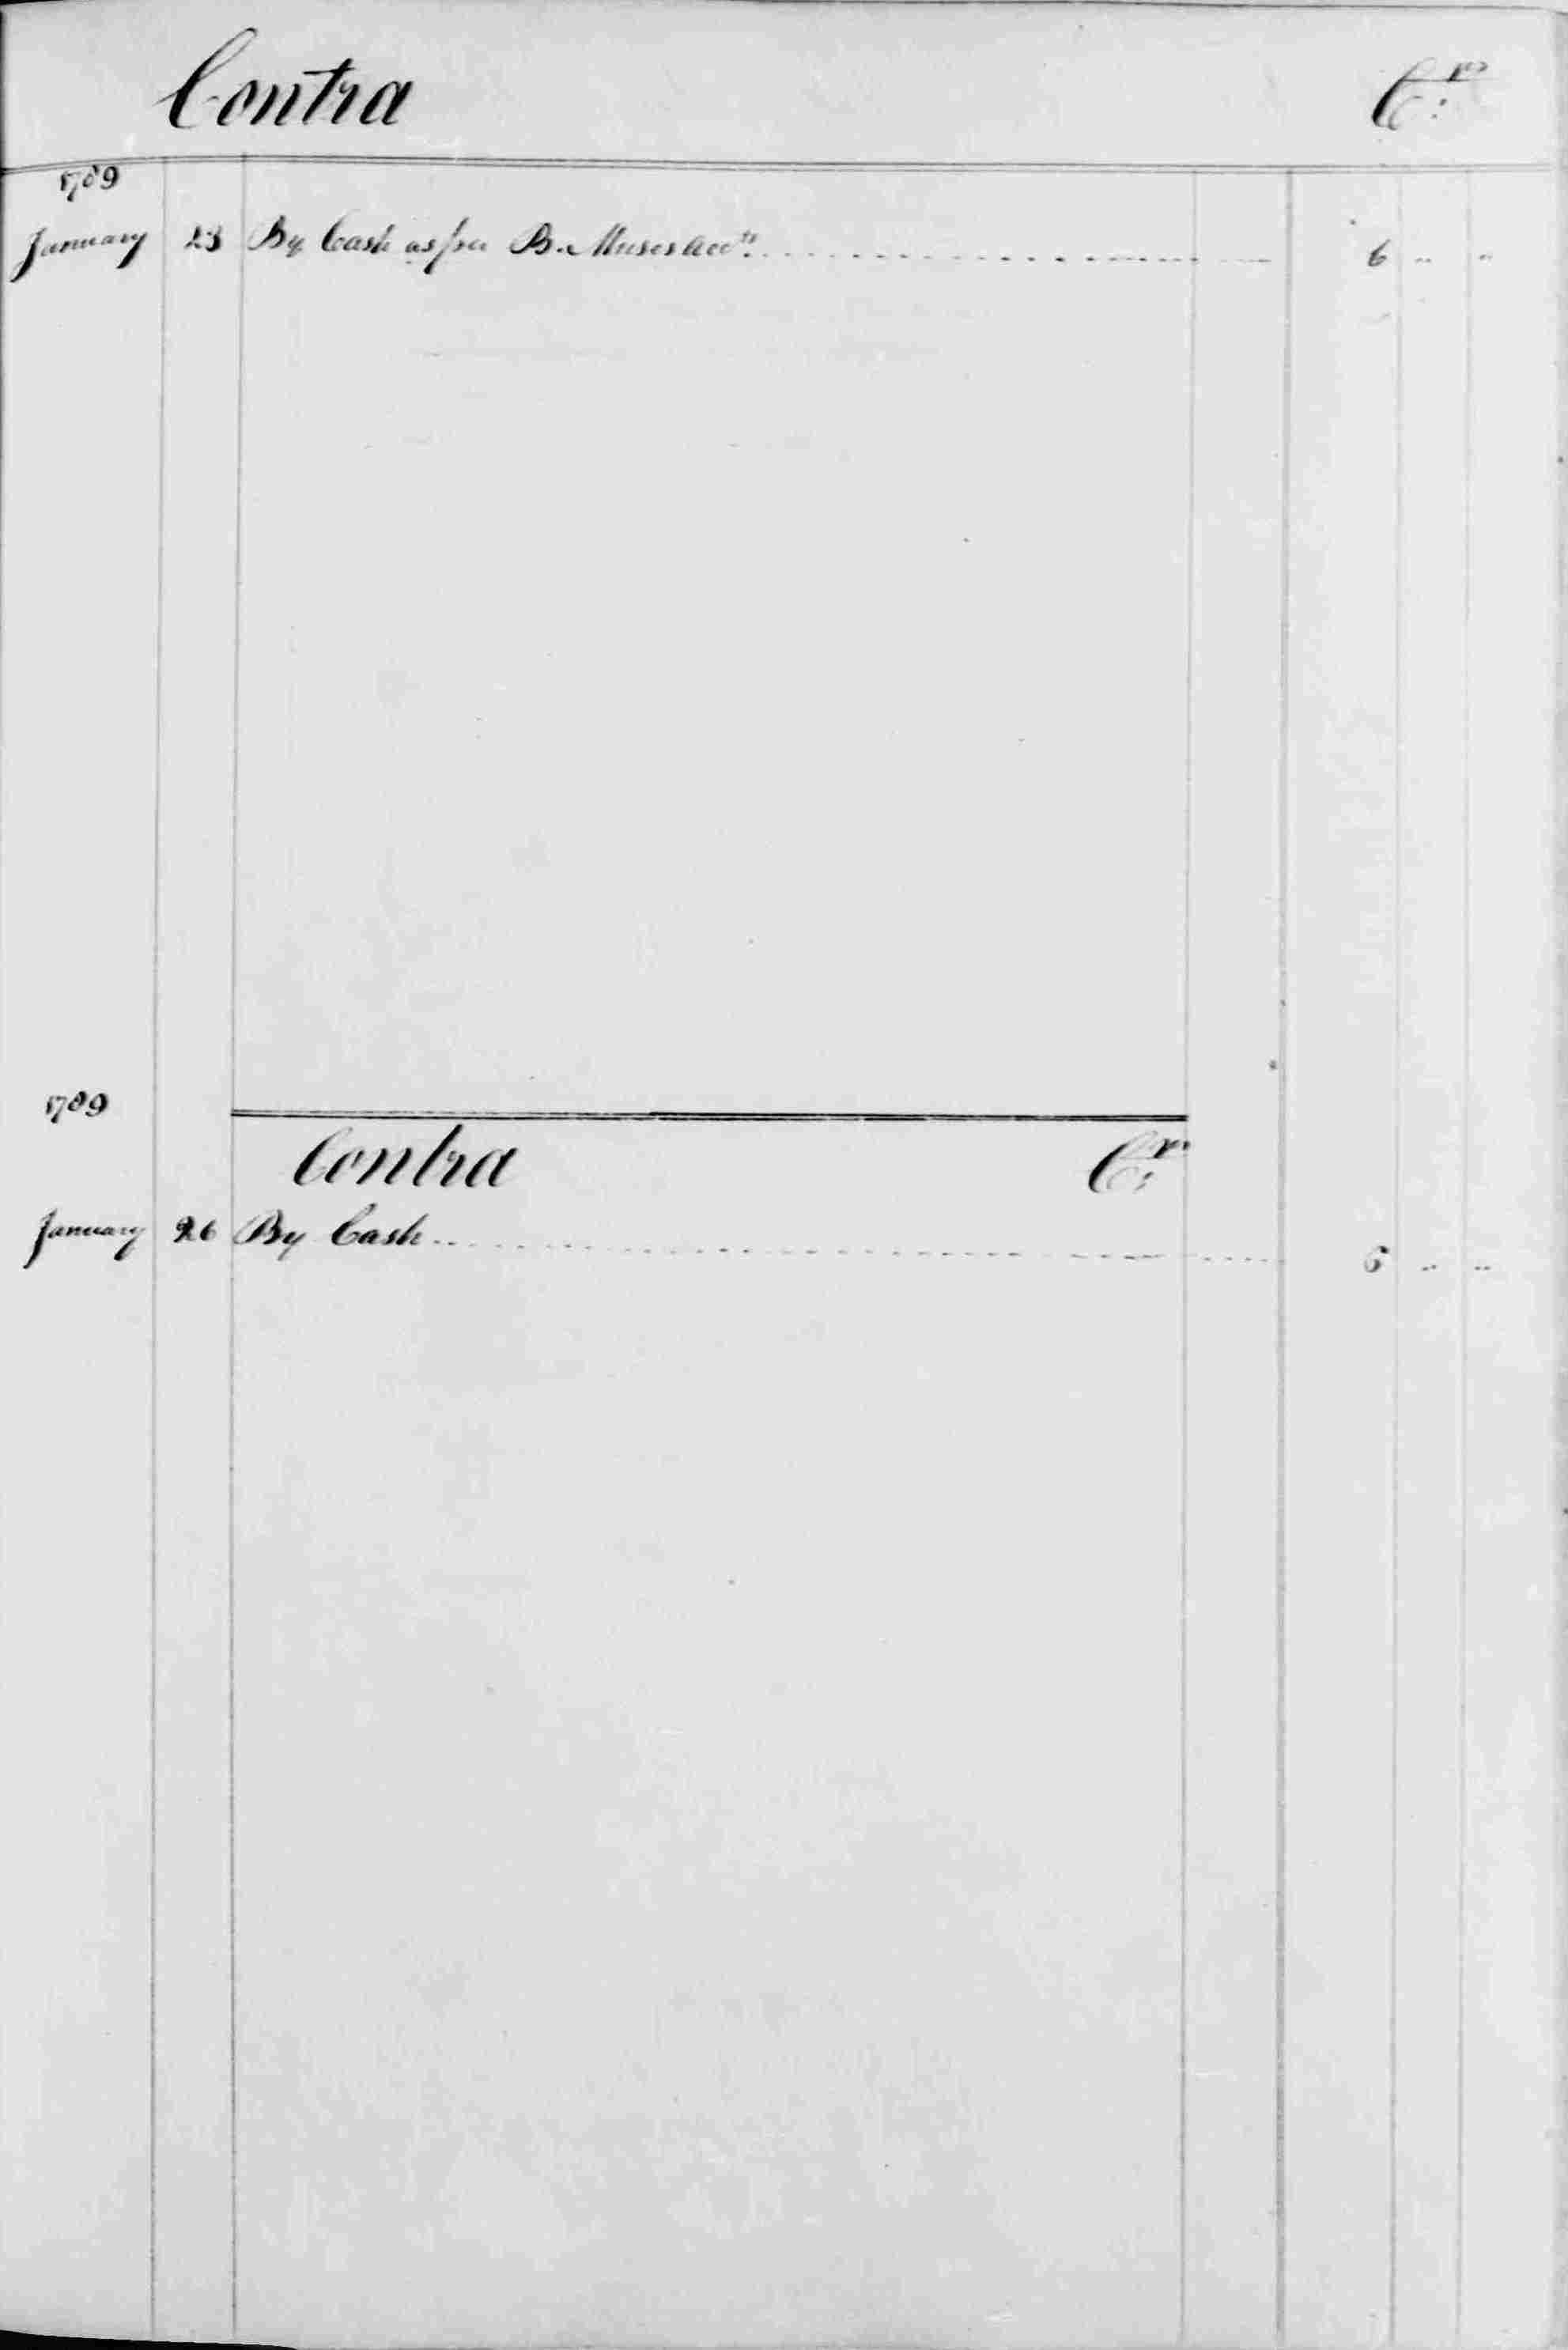 Ledger B, folio 283, right side